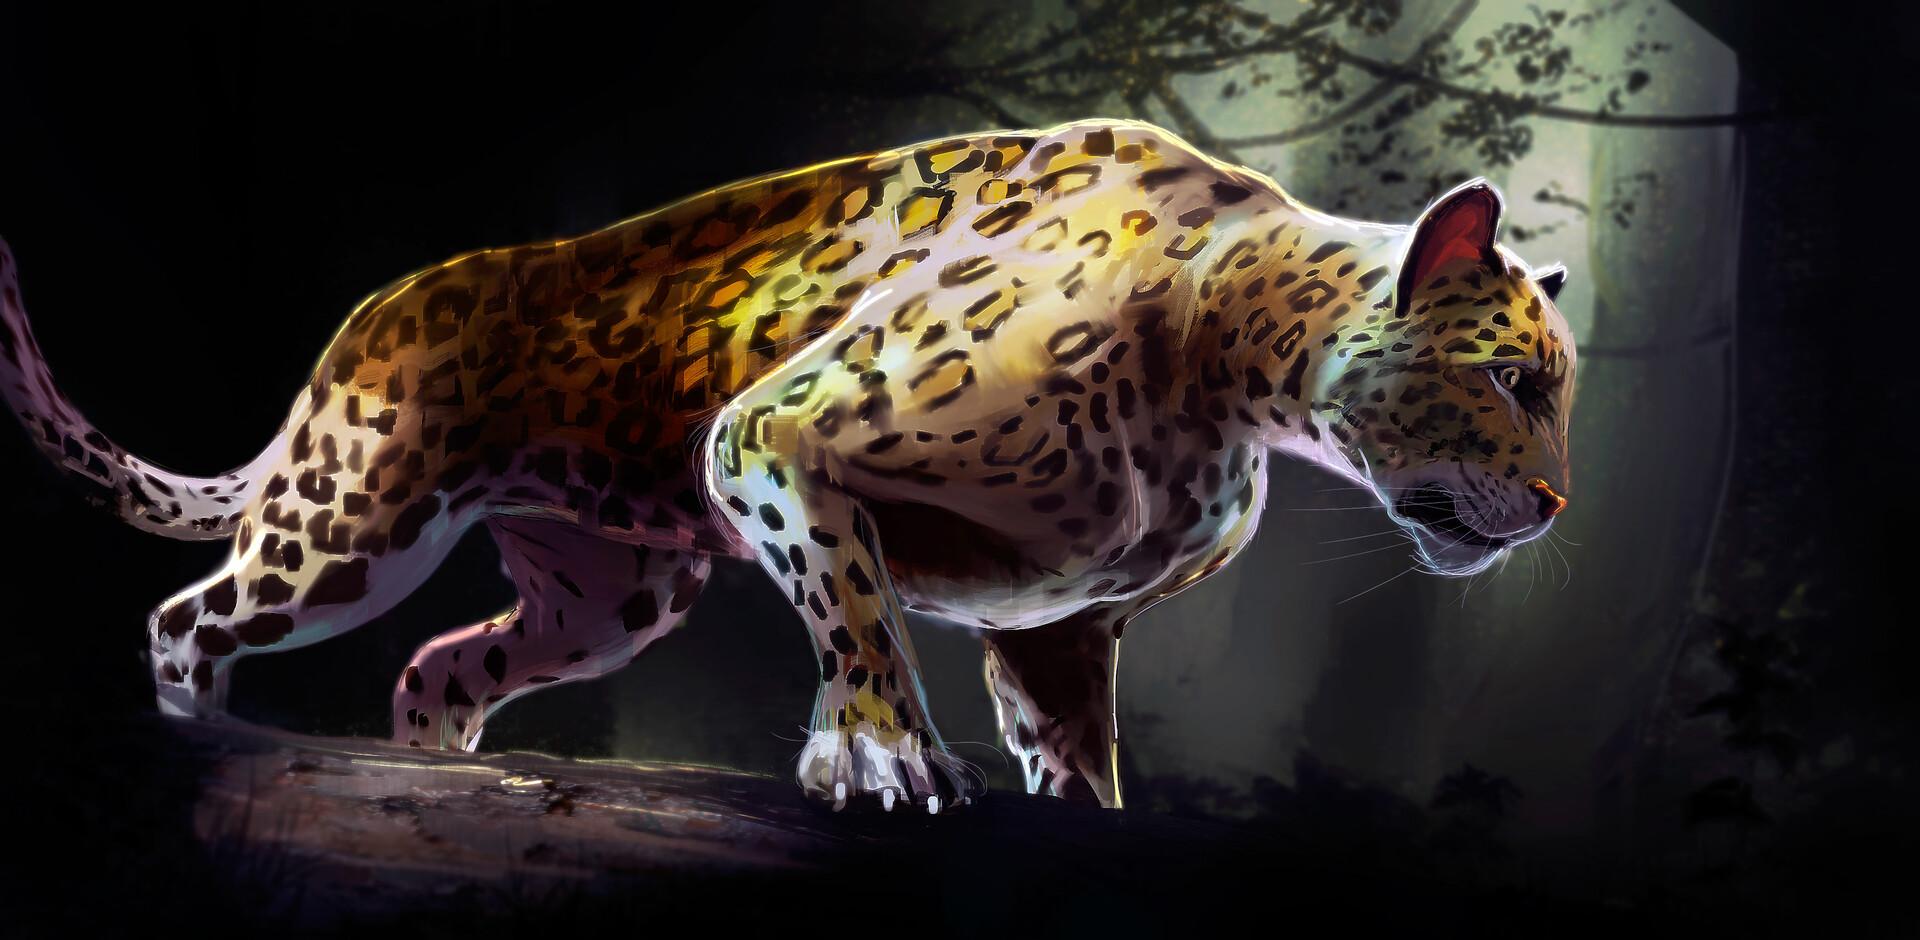 Nicolas chacin nicolaschacin jaguar ver1 0